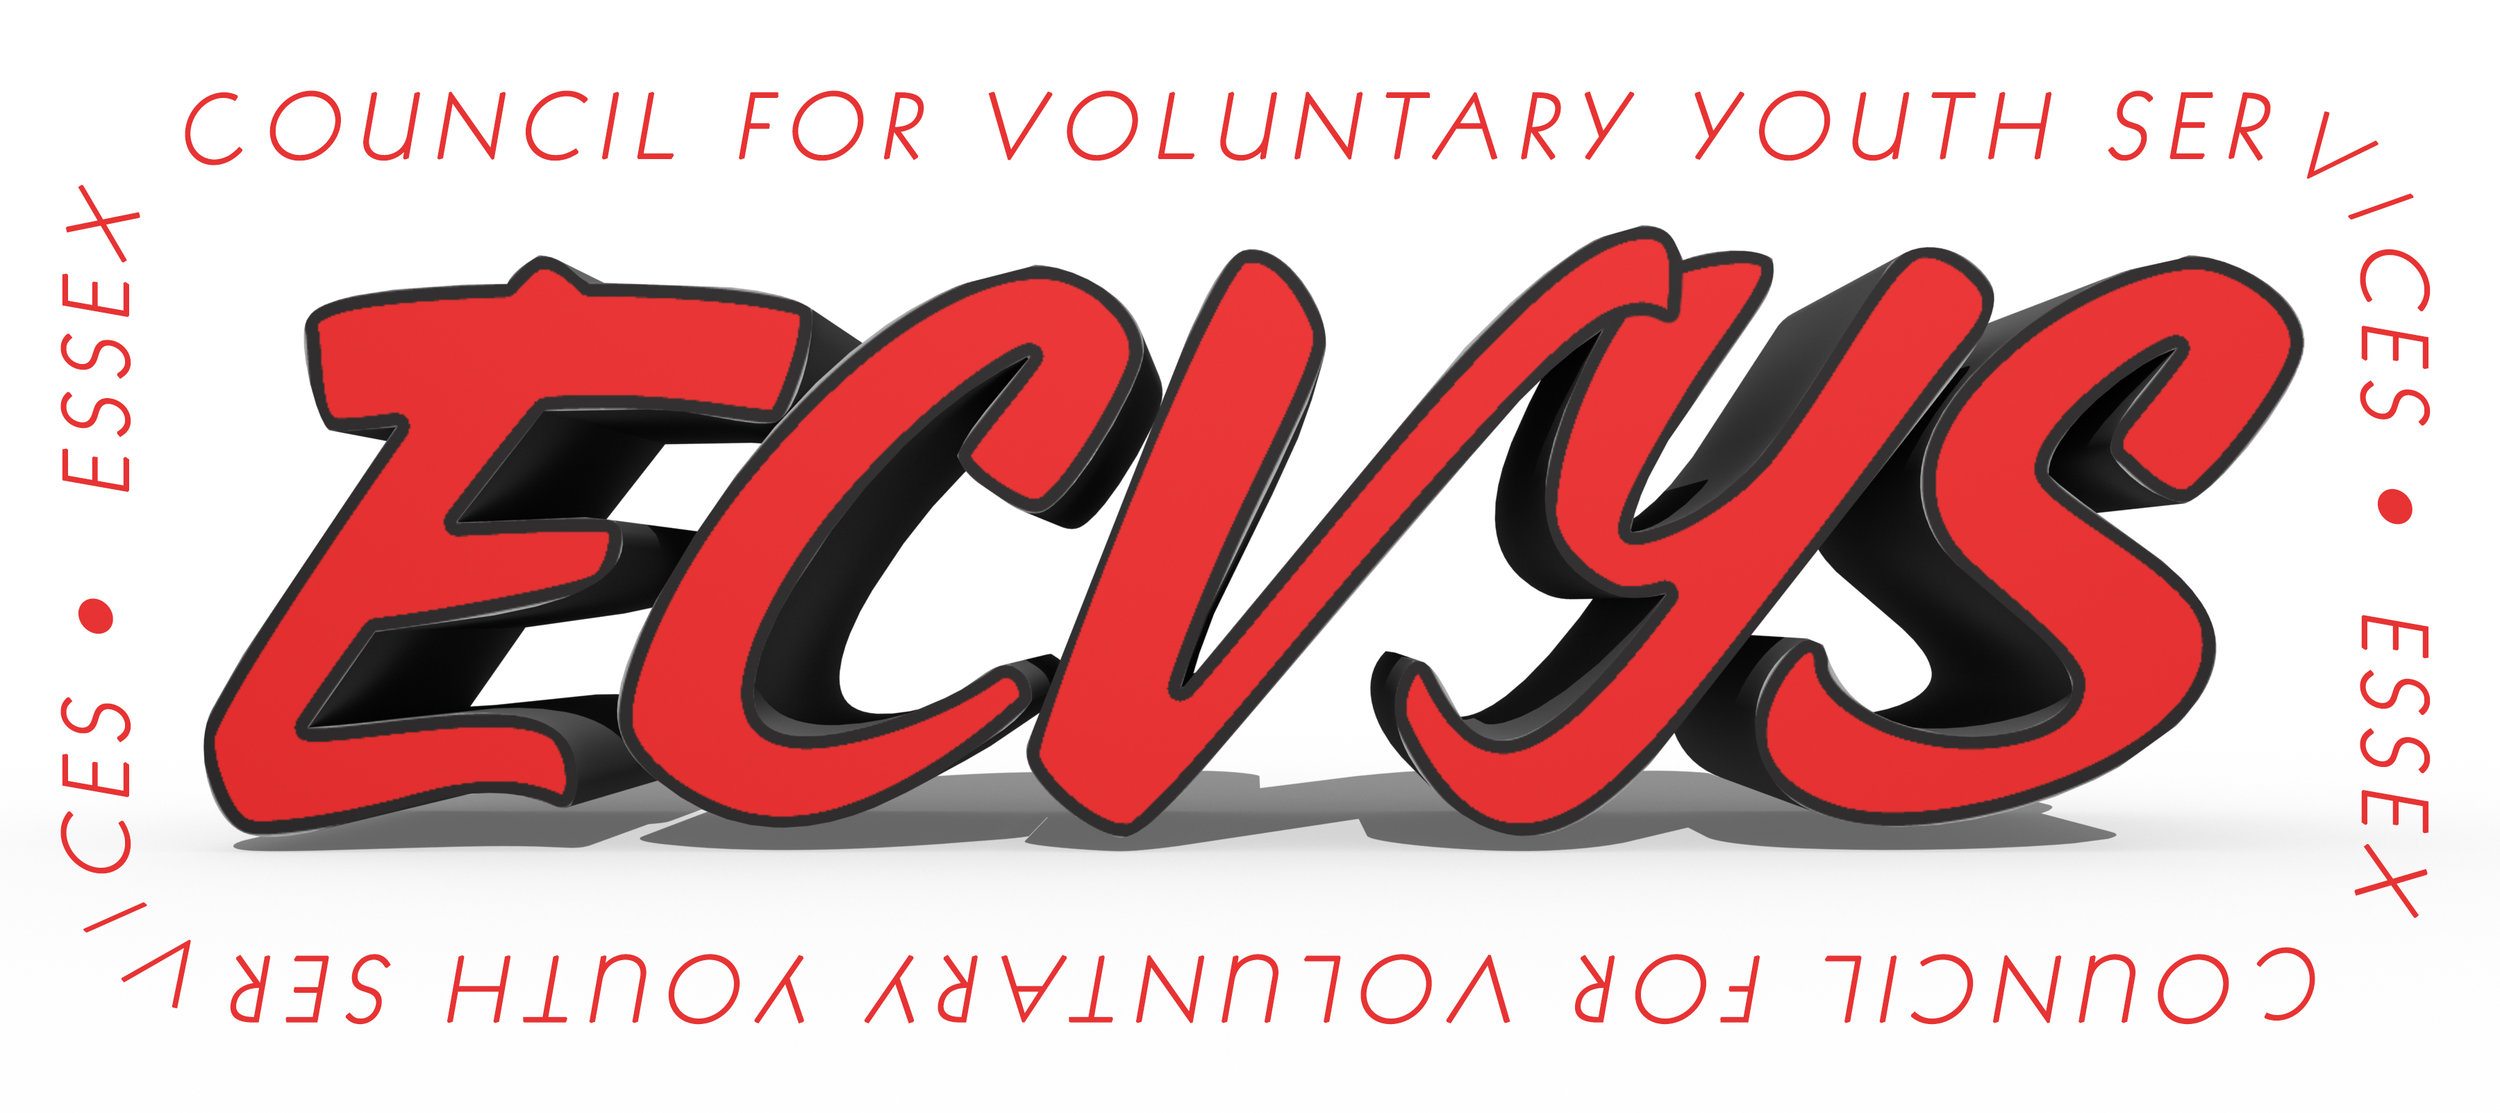 ECVYS Logo 2017  V2rendered 12 inch.jpg